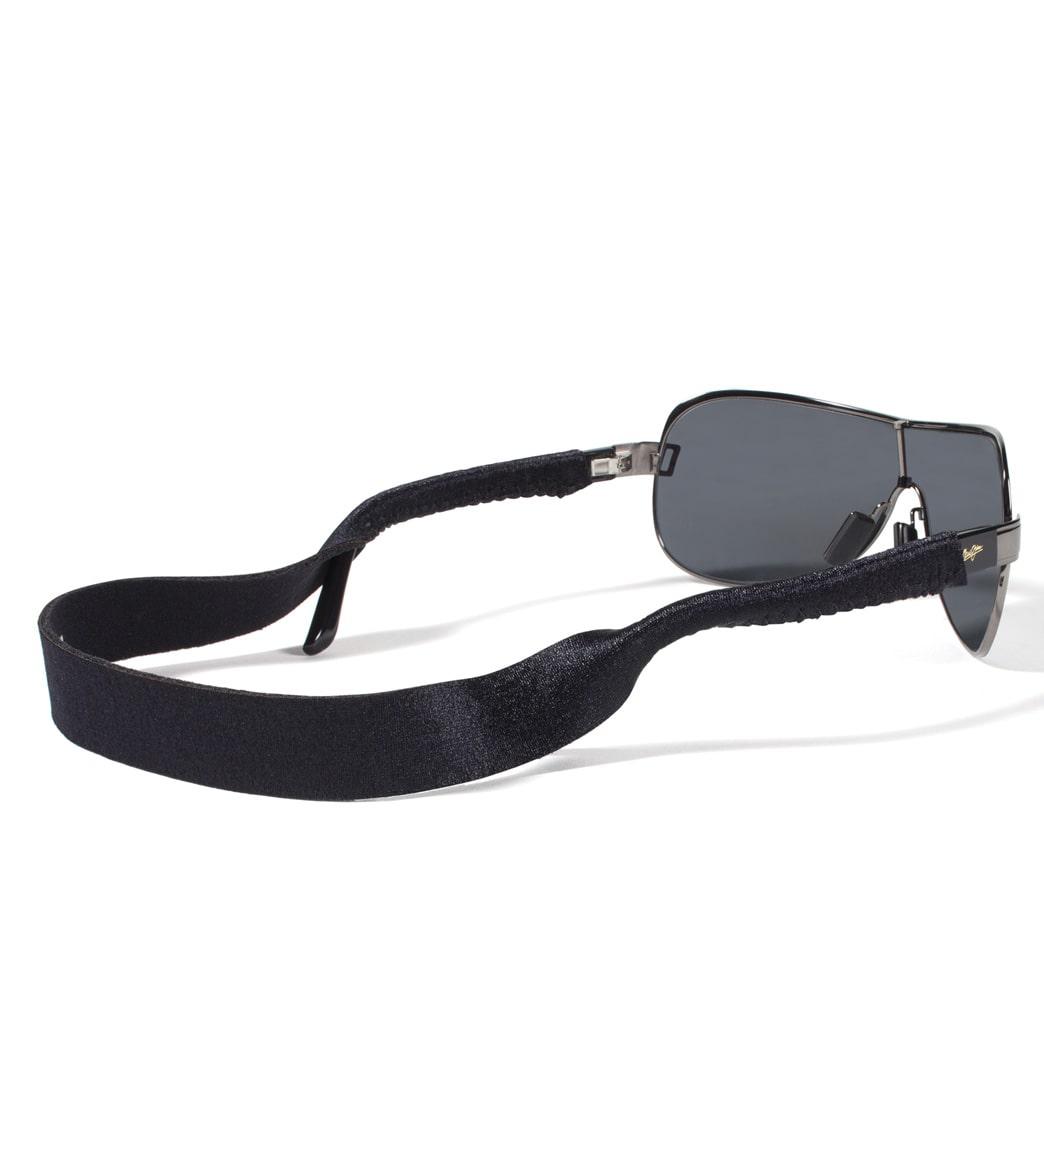 2d50d1a3ceb Croakies Original Neoprene Eyewear Retainer at SwimOutlet.com